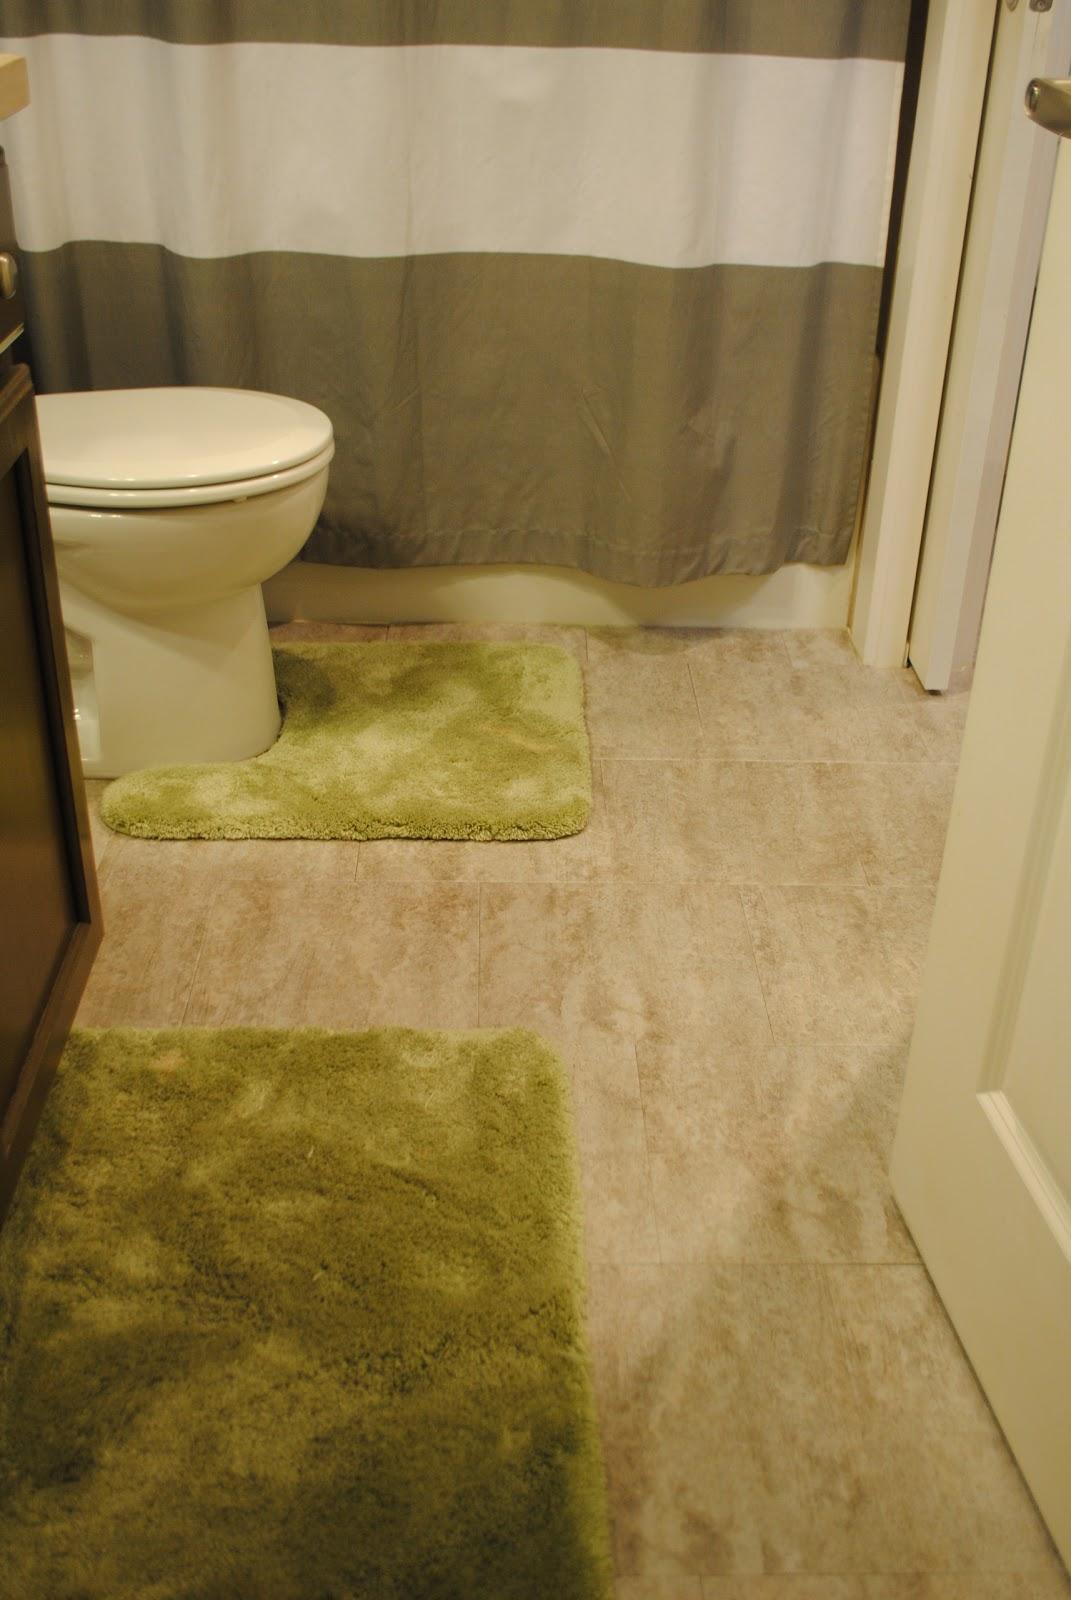 Our Emerald City Bathroom Renovation Floors